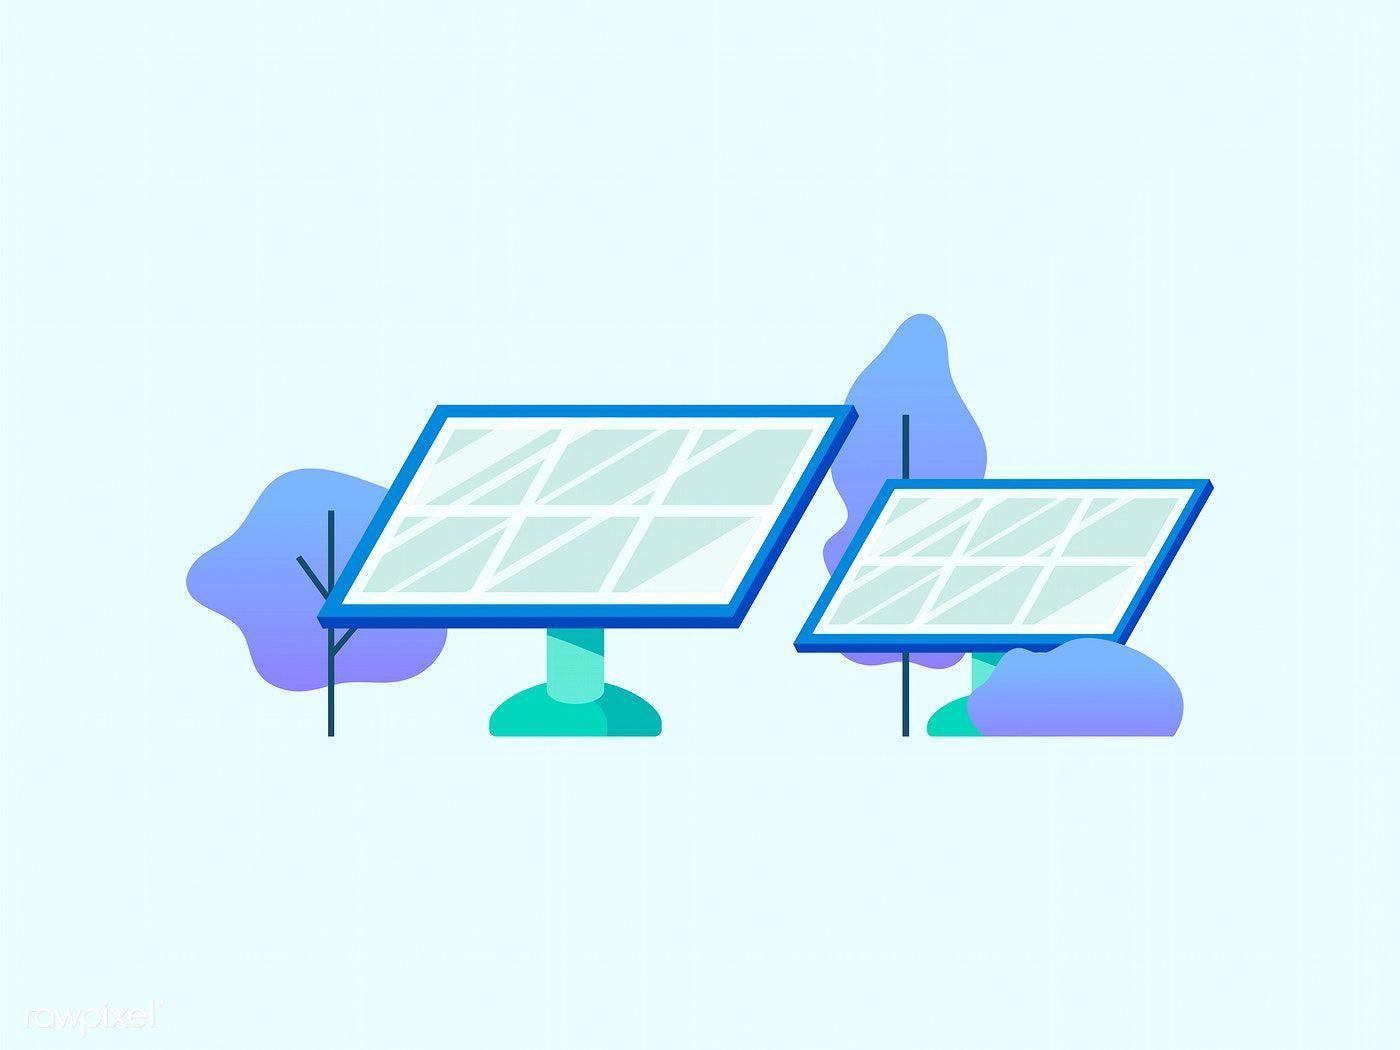 Renewableenergie Solar Panels Renewable Sources Of Energy Green Energy